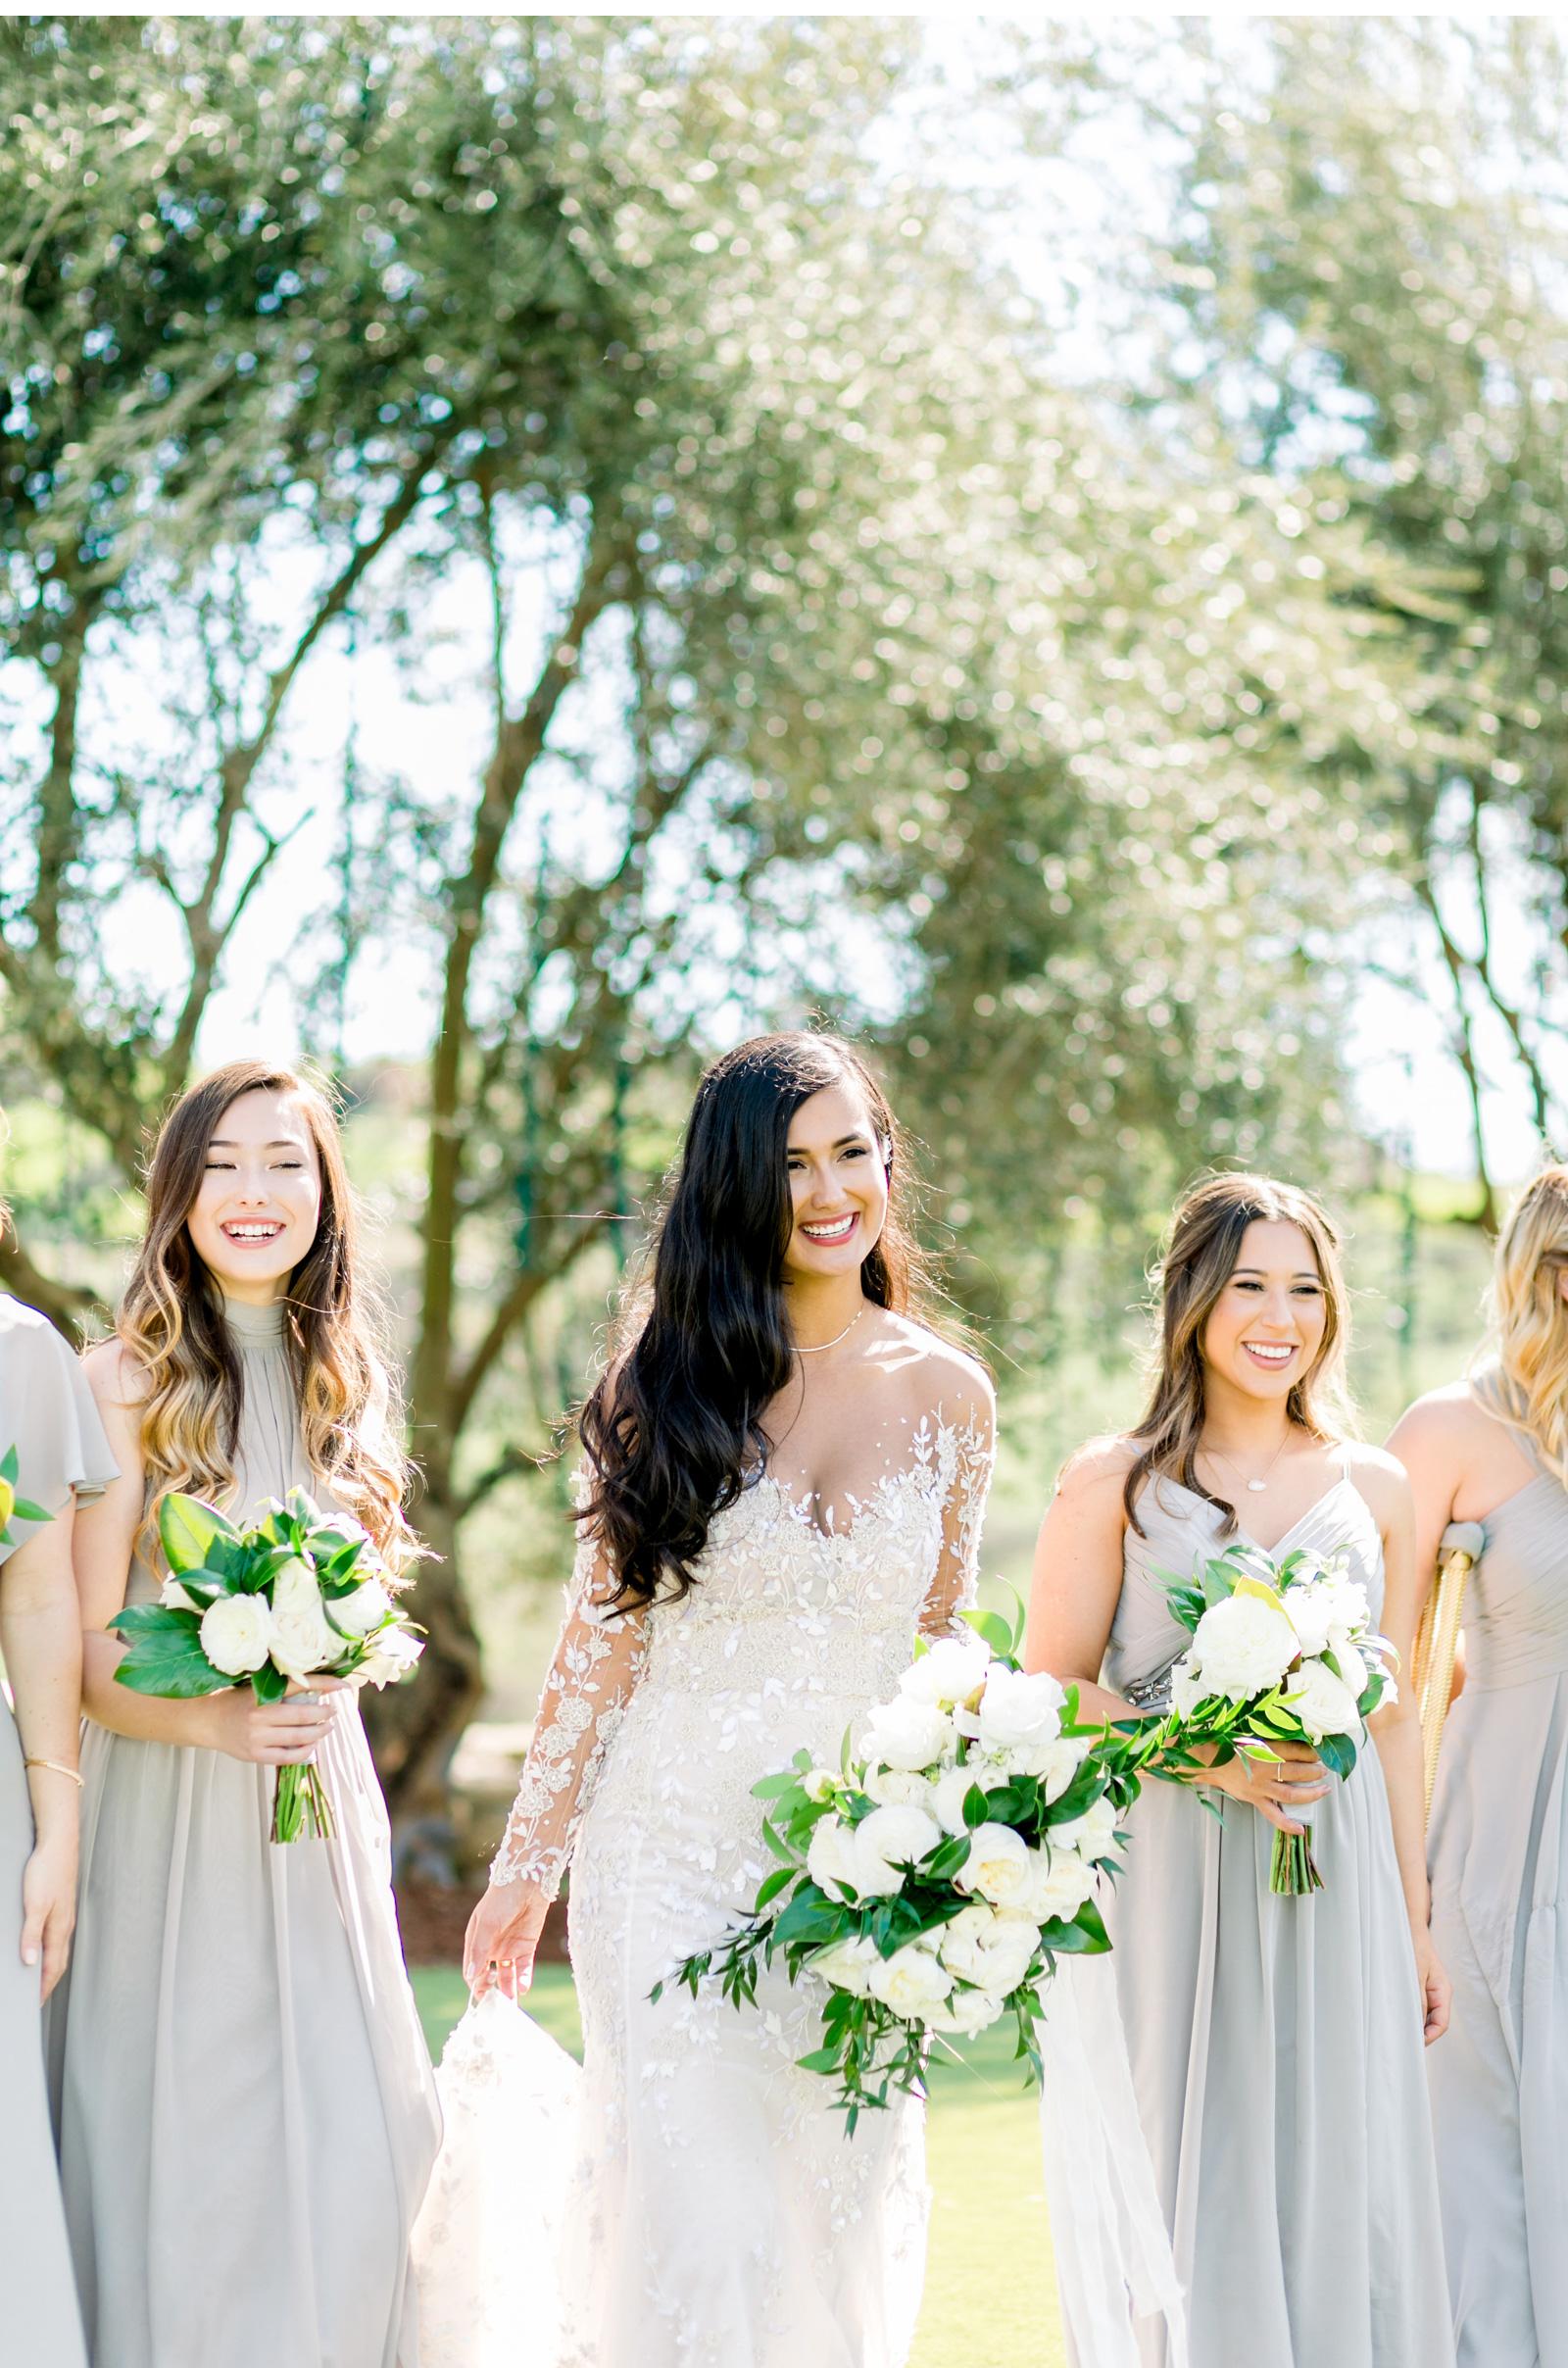 Malibu-Wedding-Venue-Photographer-Southern-California-Fine-Art-Wedding-Photo-Style-Me-Pretty-Natalie-Schutt-Photography_09.jpg